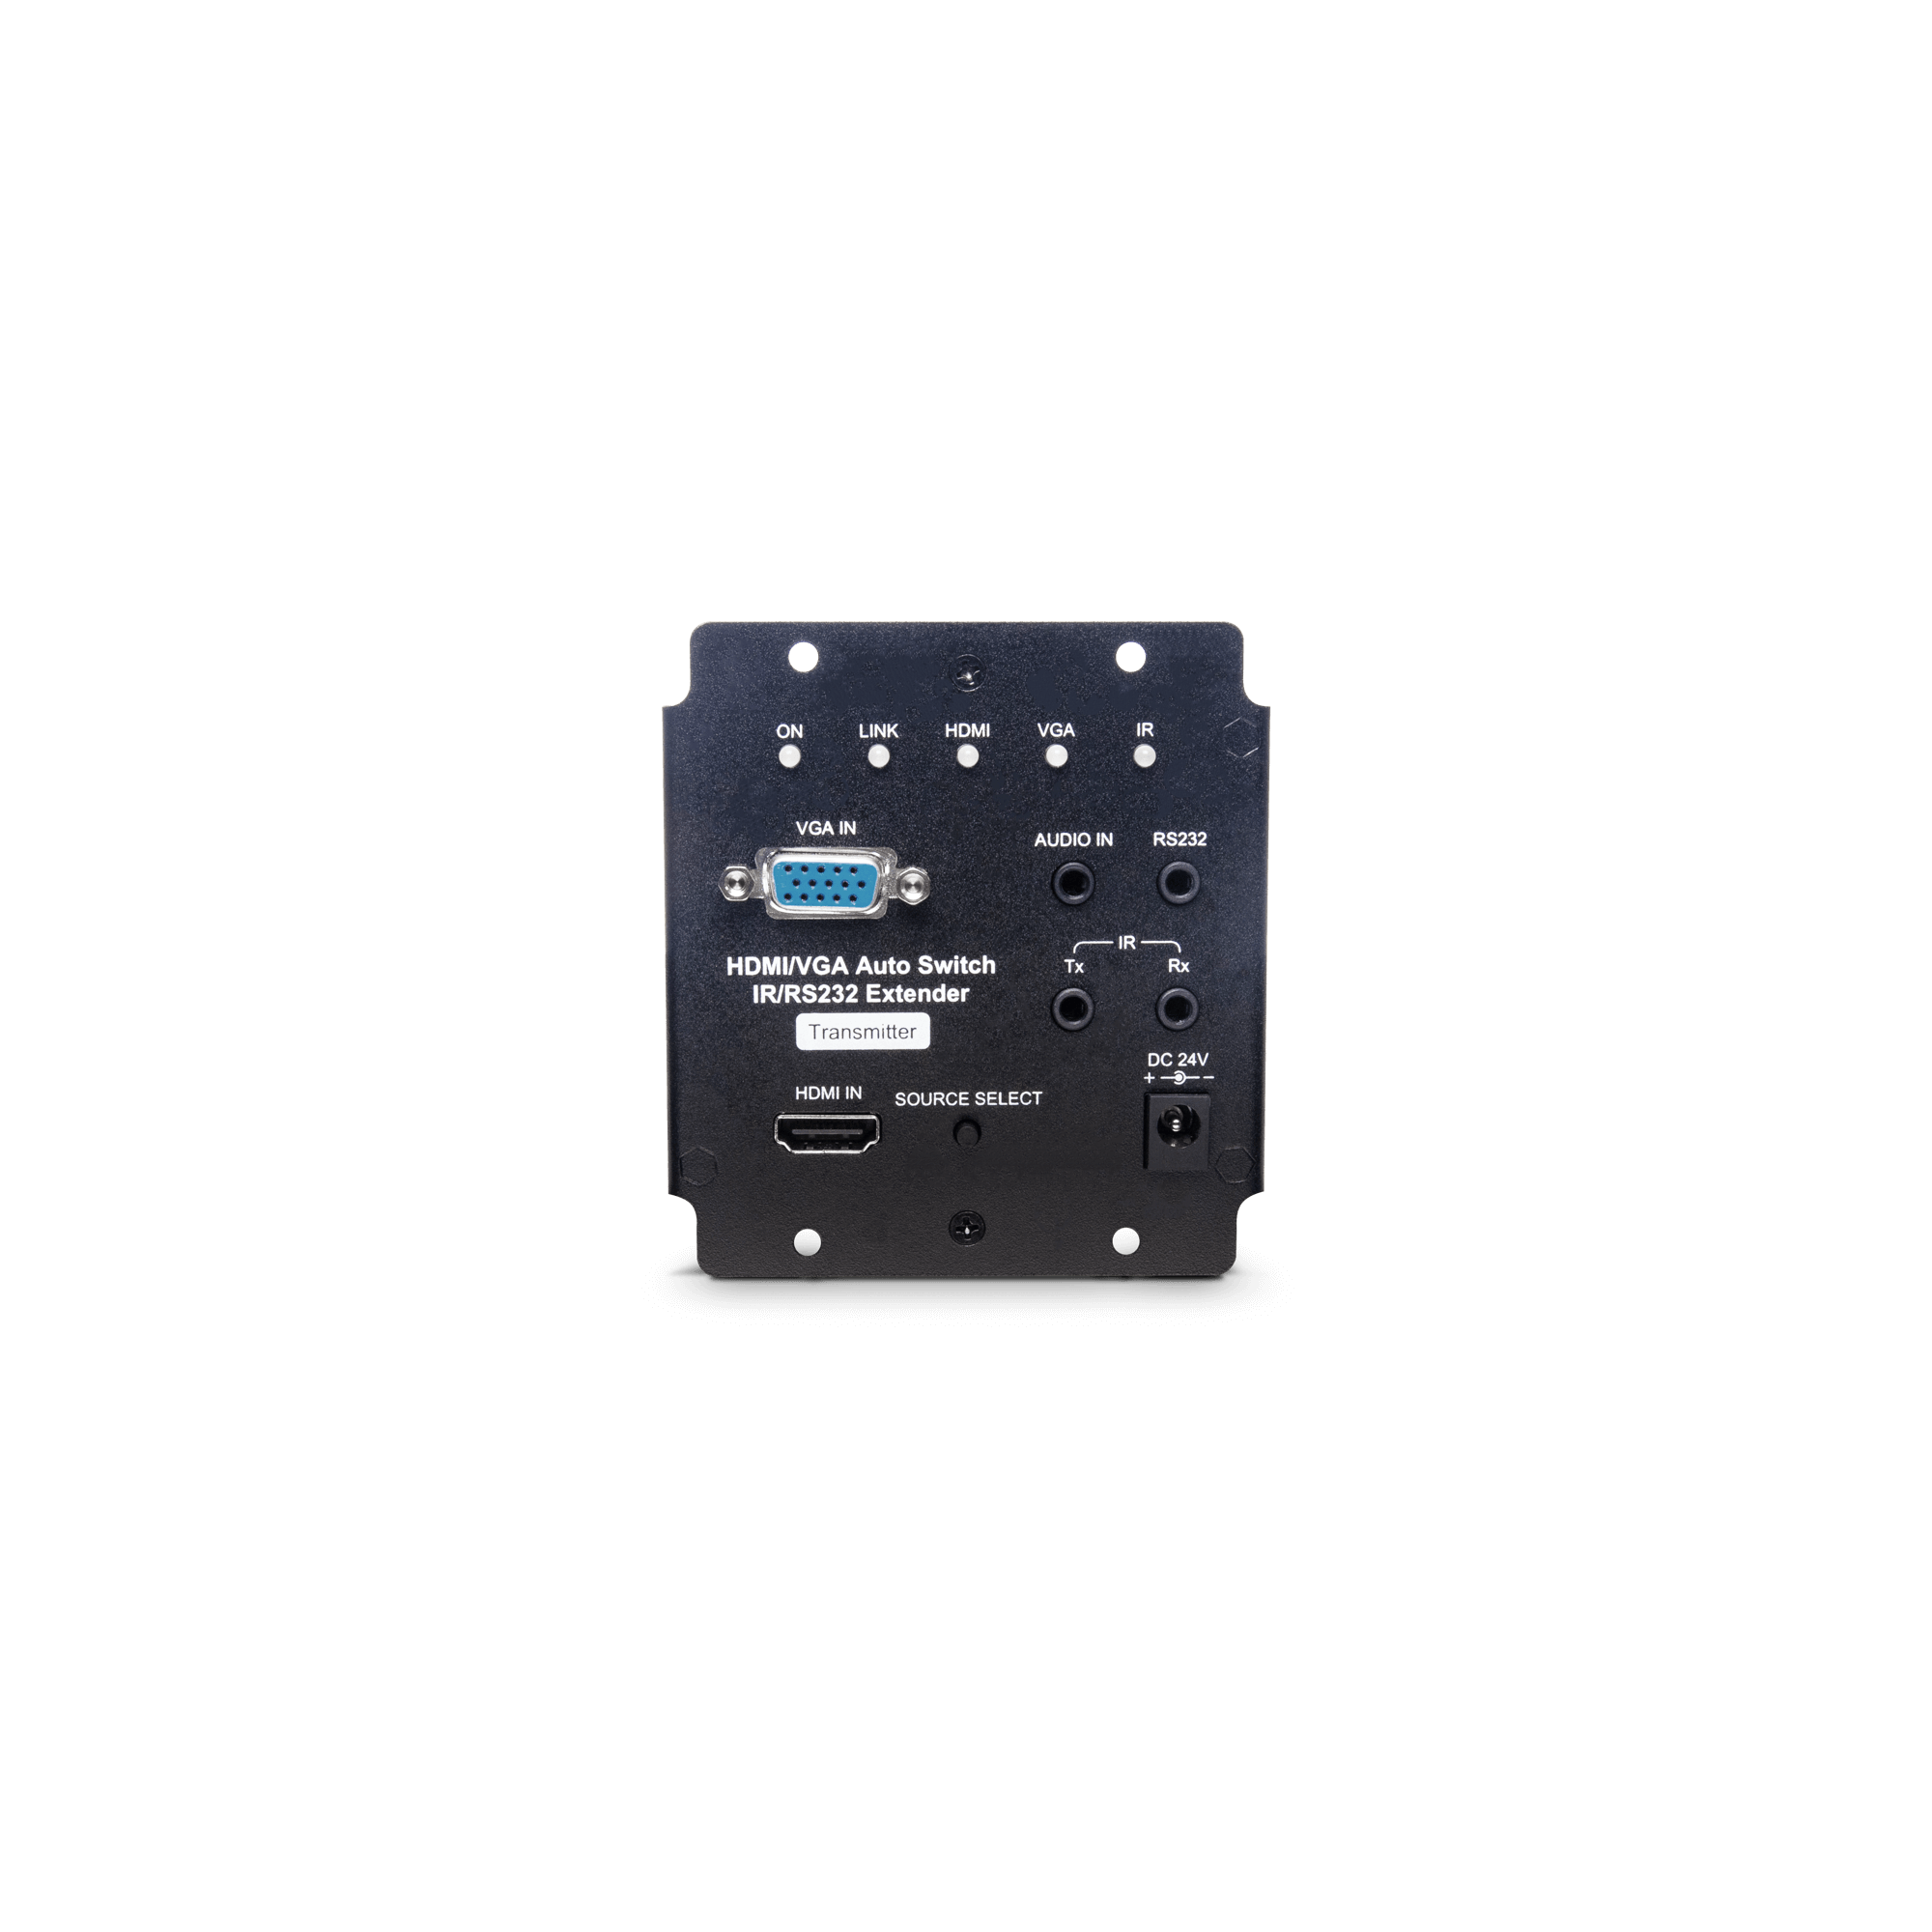 4K VGA/HDMI Auto-Switching & IR/RS232/POH HDBaseT Extender 70M